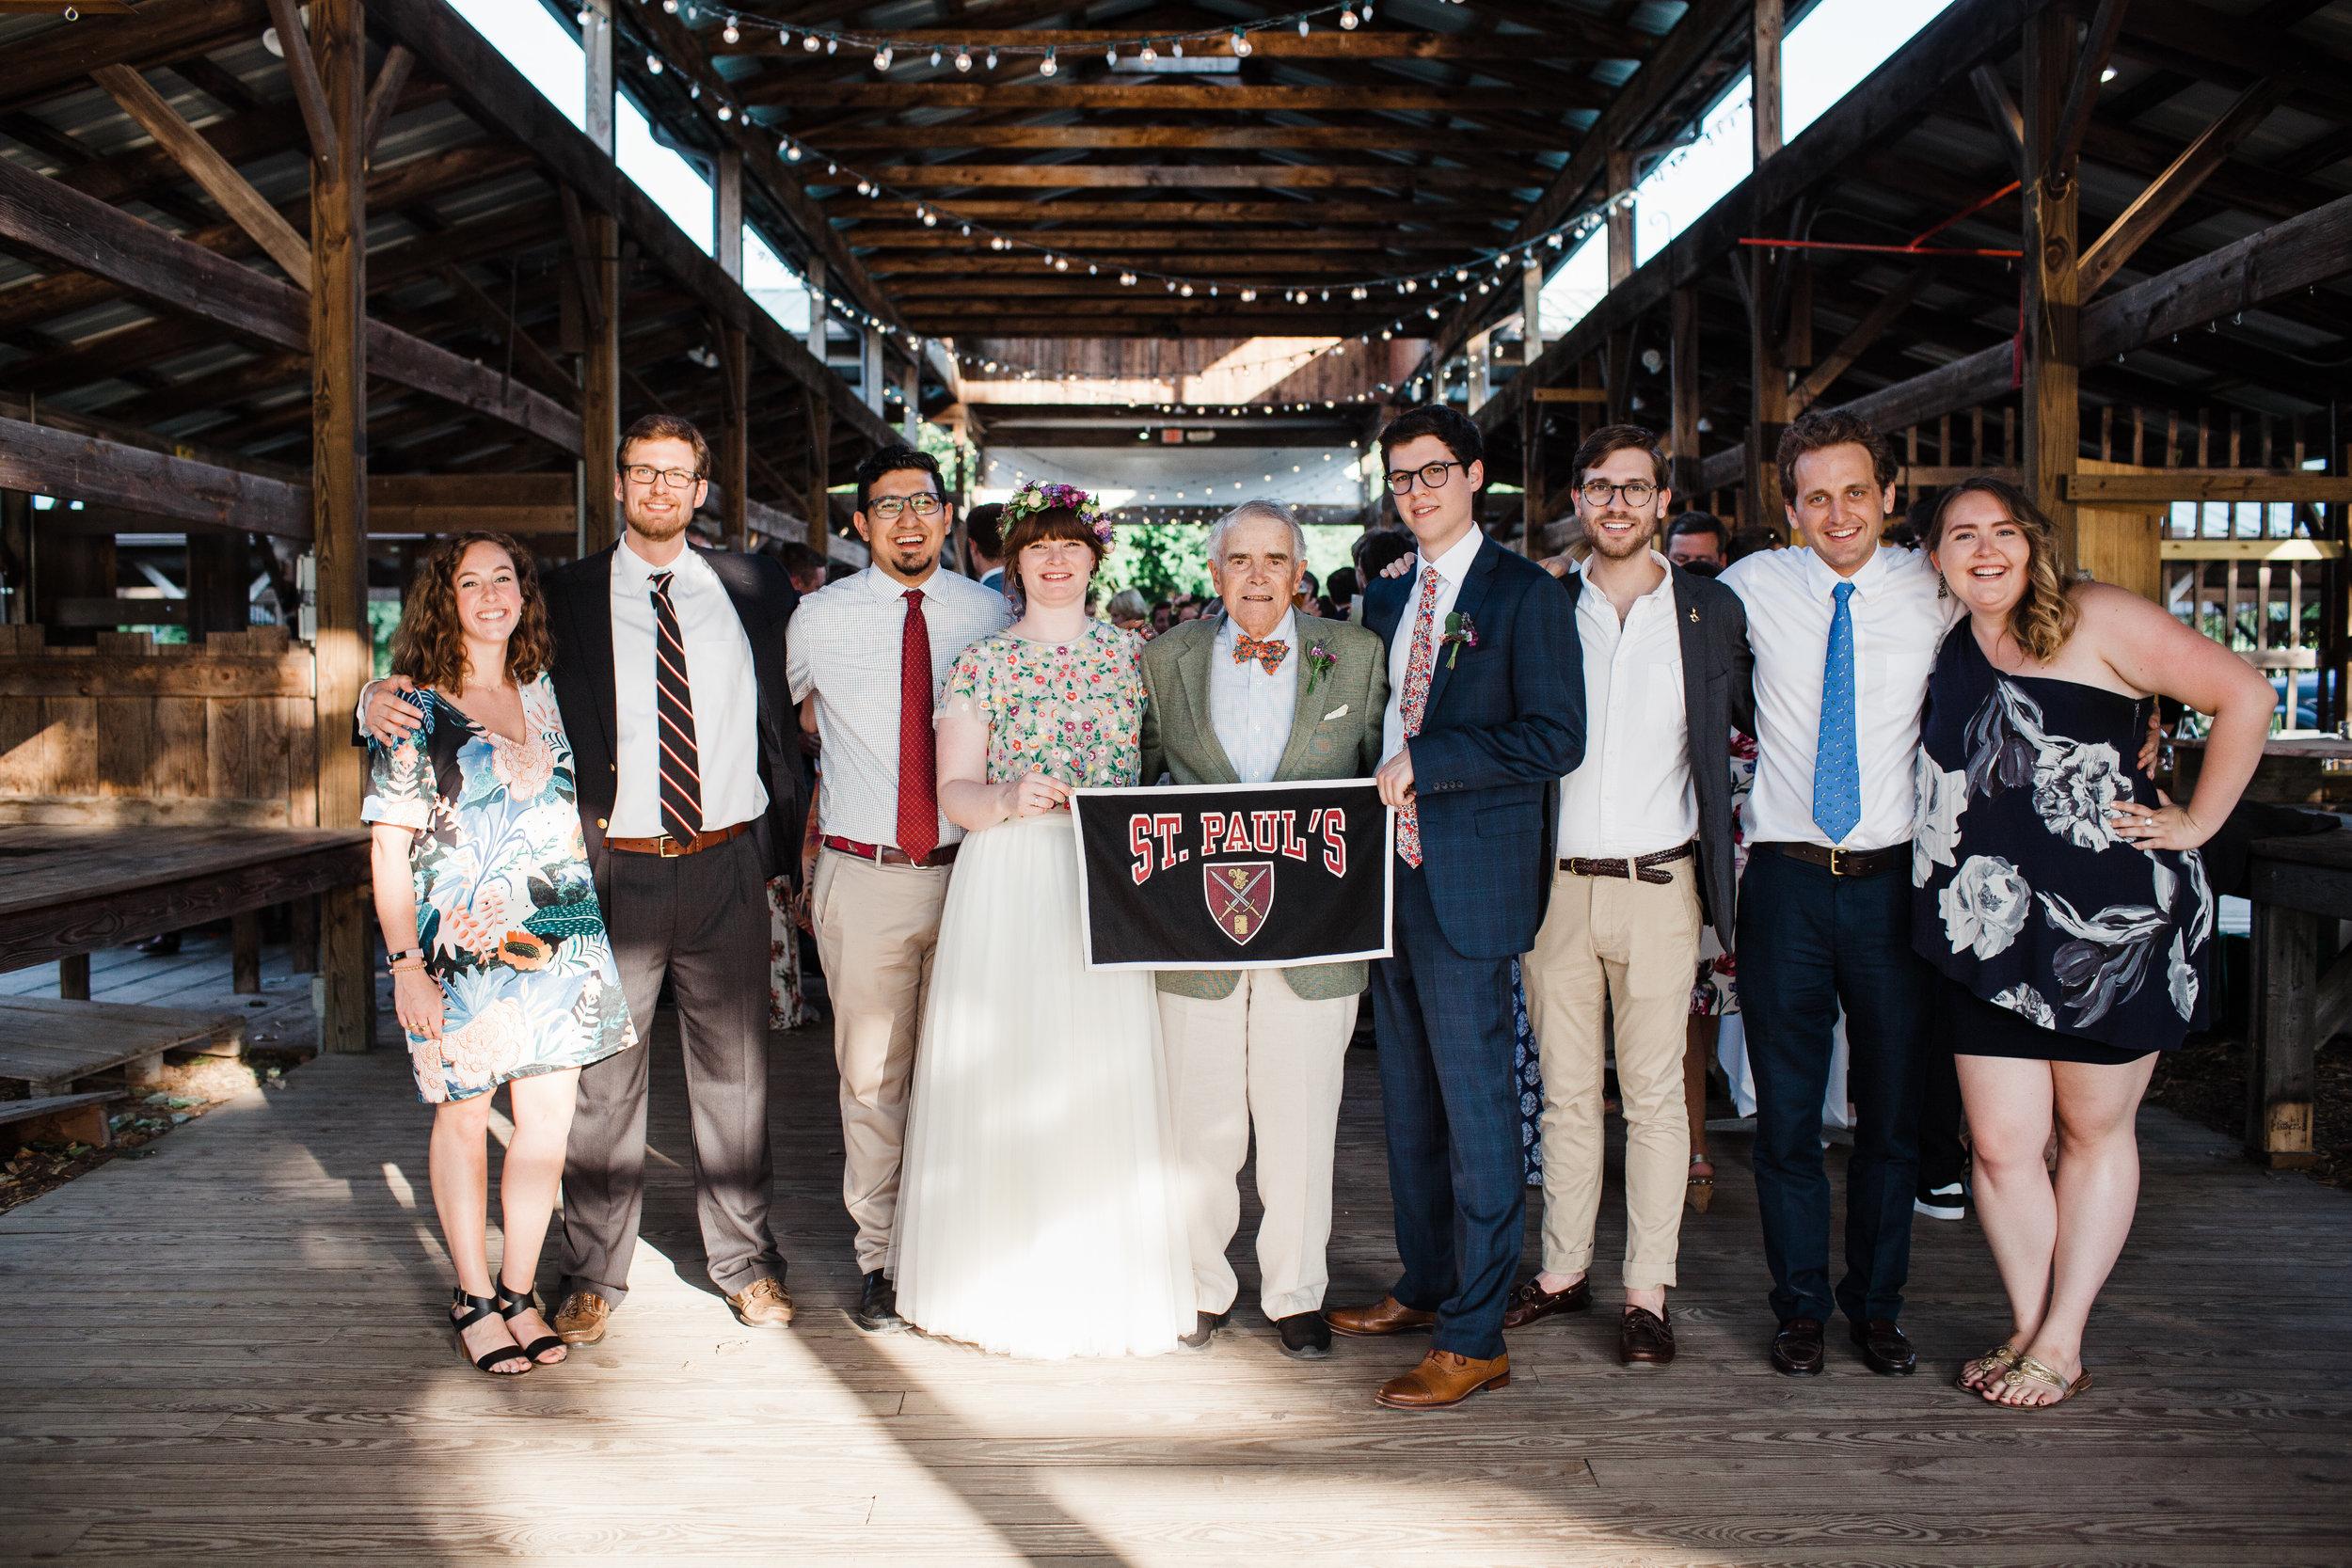 Sarah (Martie) Curran '12 married Alberto Arnedo Ruiz in Ithaca, N.Y., on July 13, 2018, alongside (l. to r.) Grace Cullinan '11, Andrew Clark '12, Enrique Granados '12, the bride, Ed Harding '54, the groom, Taylor Poulos '12, Woody Winmill '12, and Kate Borst '12.